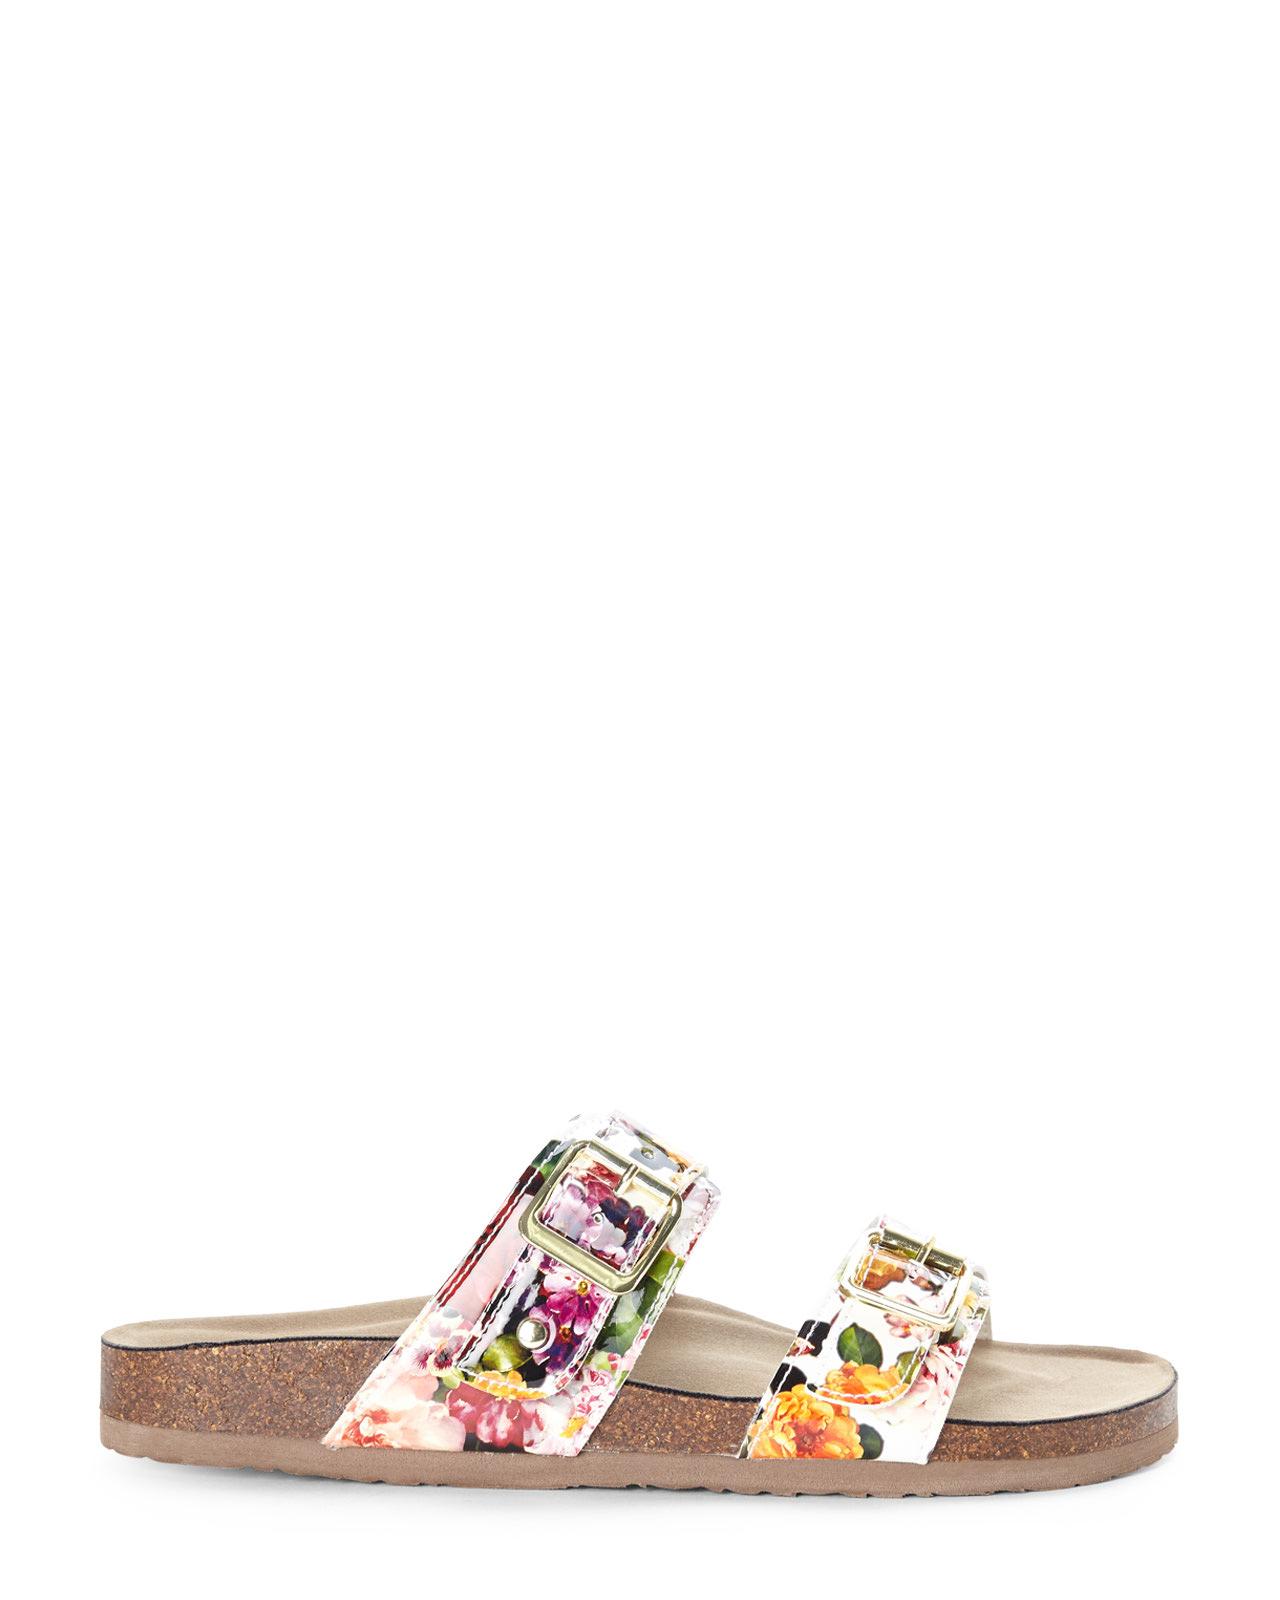 Lyst Madden Girl White Floral Brando Sandals In White